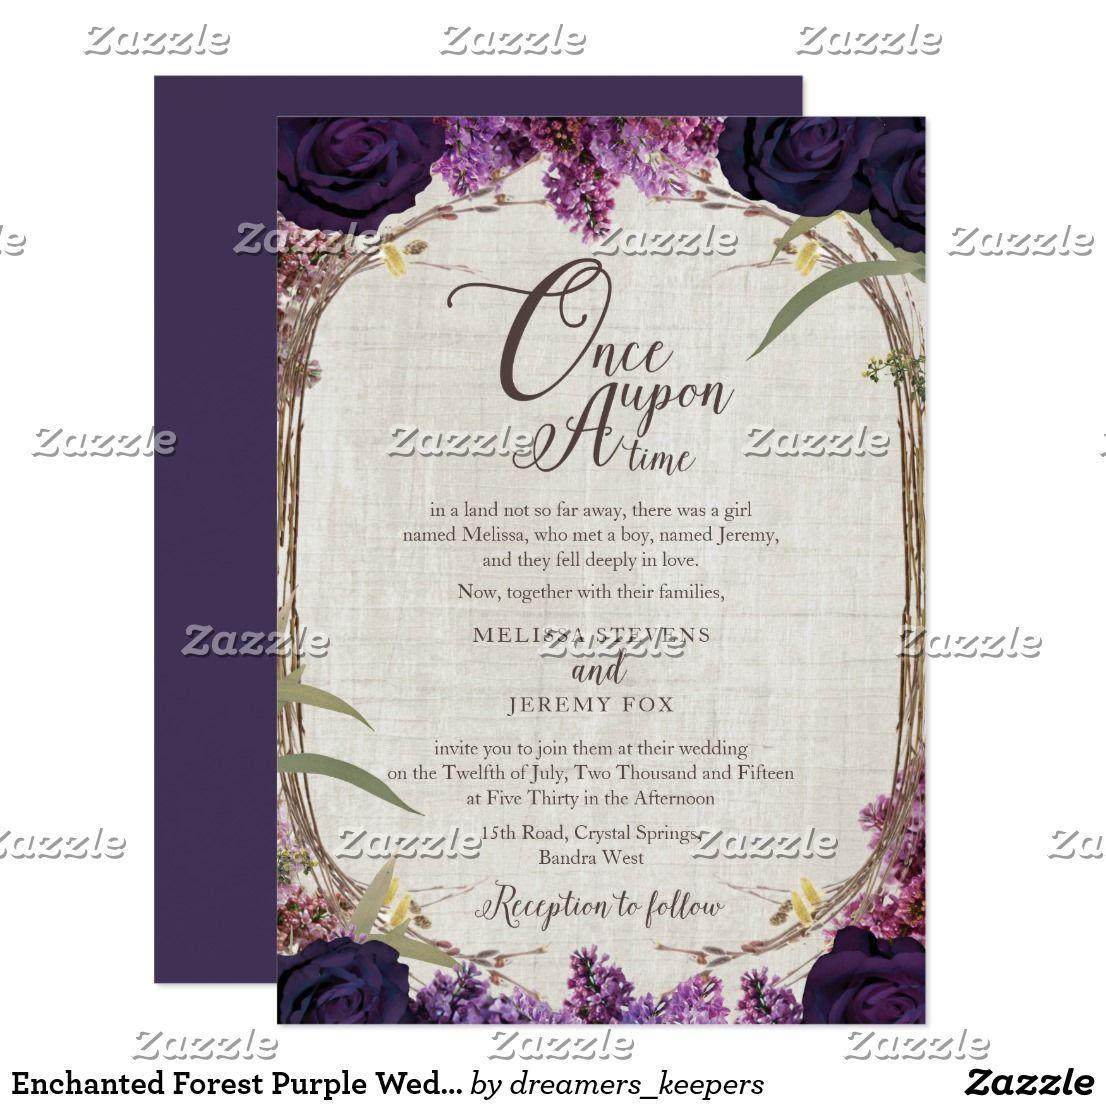 Enchanted Forest Purple Wedding Invitation Card Zazzle Com Wedding Invitation Cards Purple Wedding Invitations Zazzle Wedding Invitations